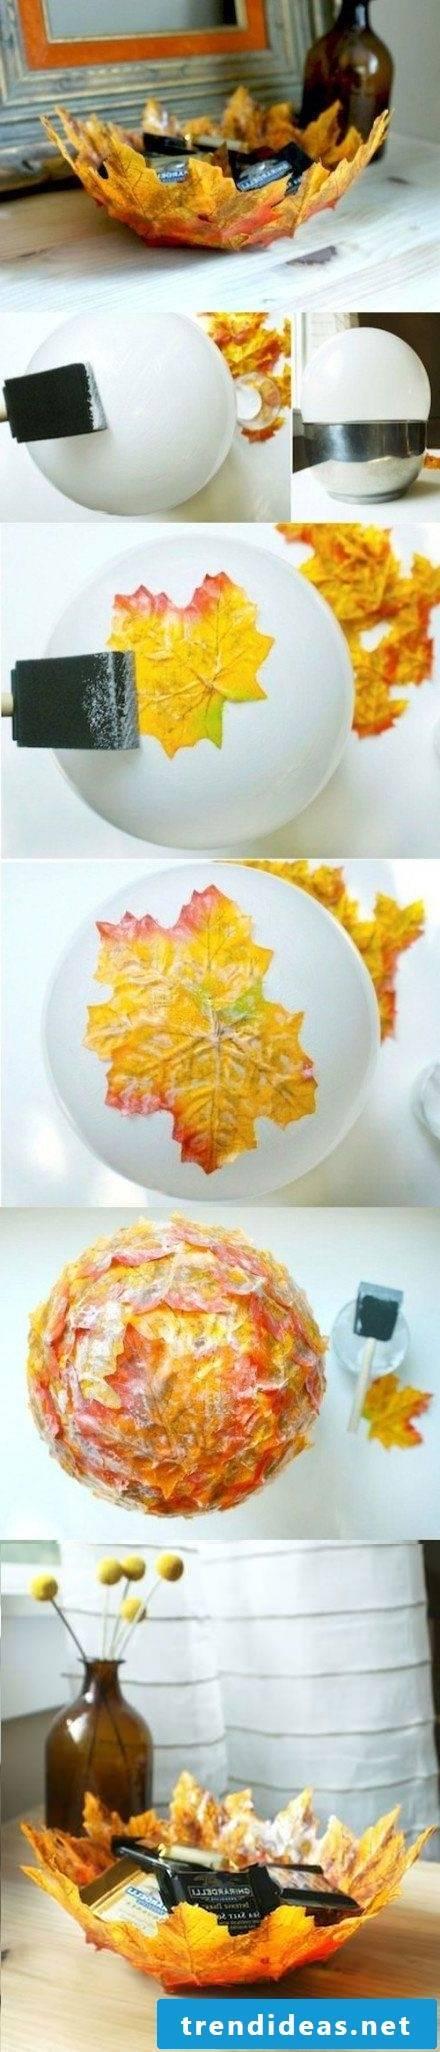 Table decoration autumn - making autumn leaves